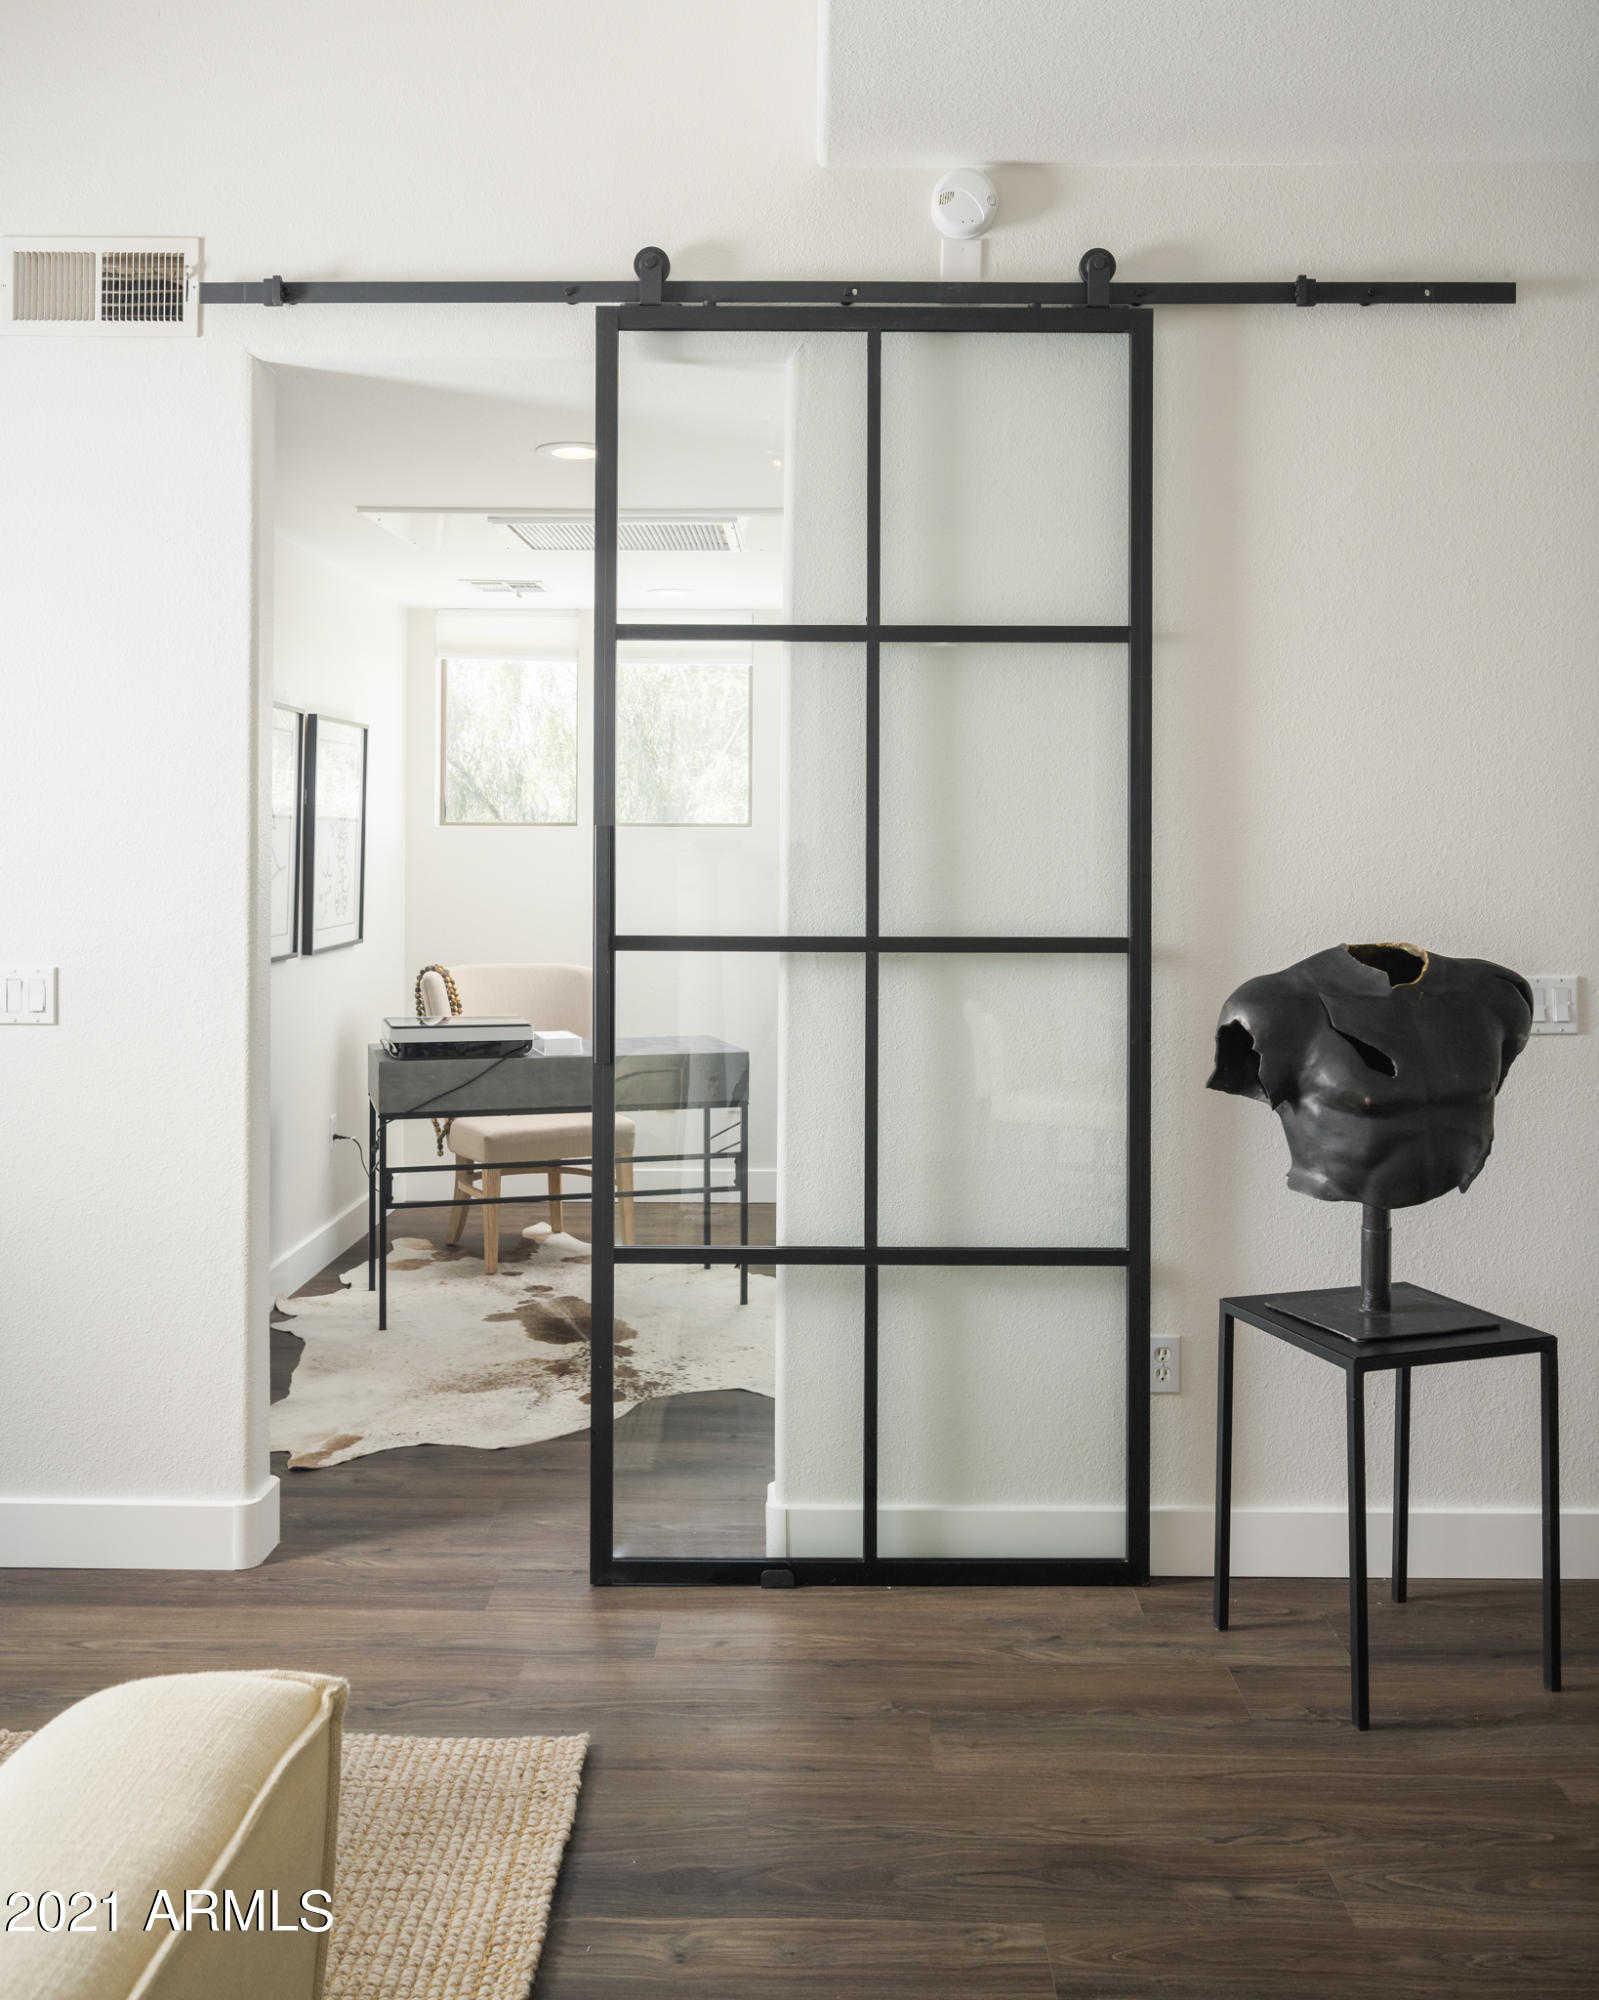 $450,000 - 2Br/2Ba -  for Sale in Edge At Grayhawk Condominium, Scottsdale